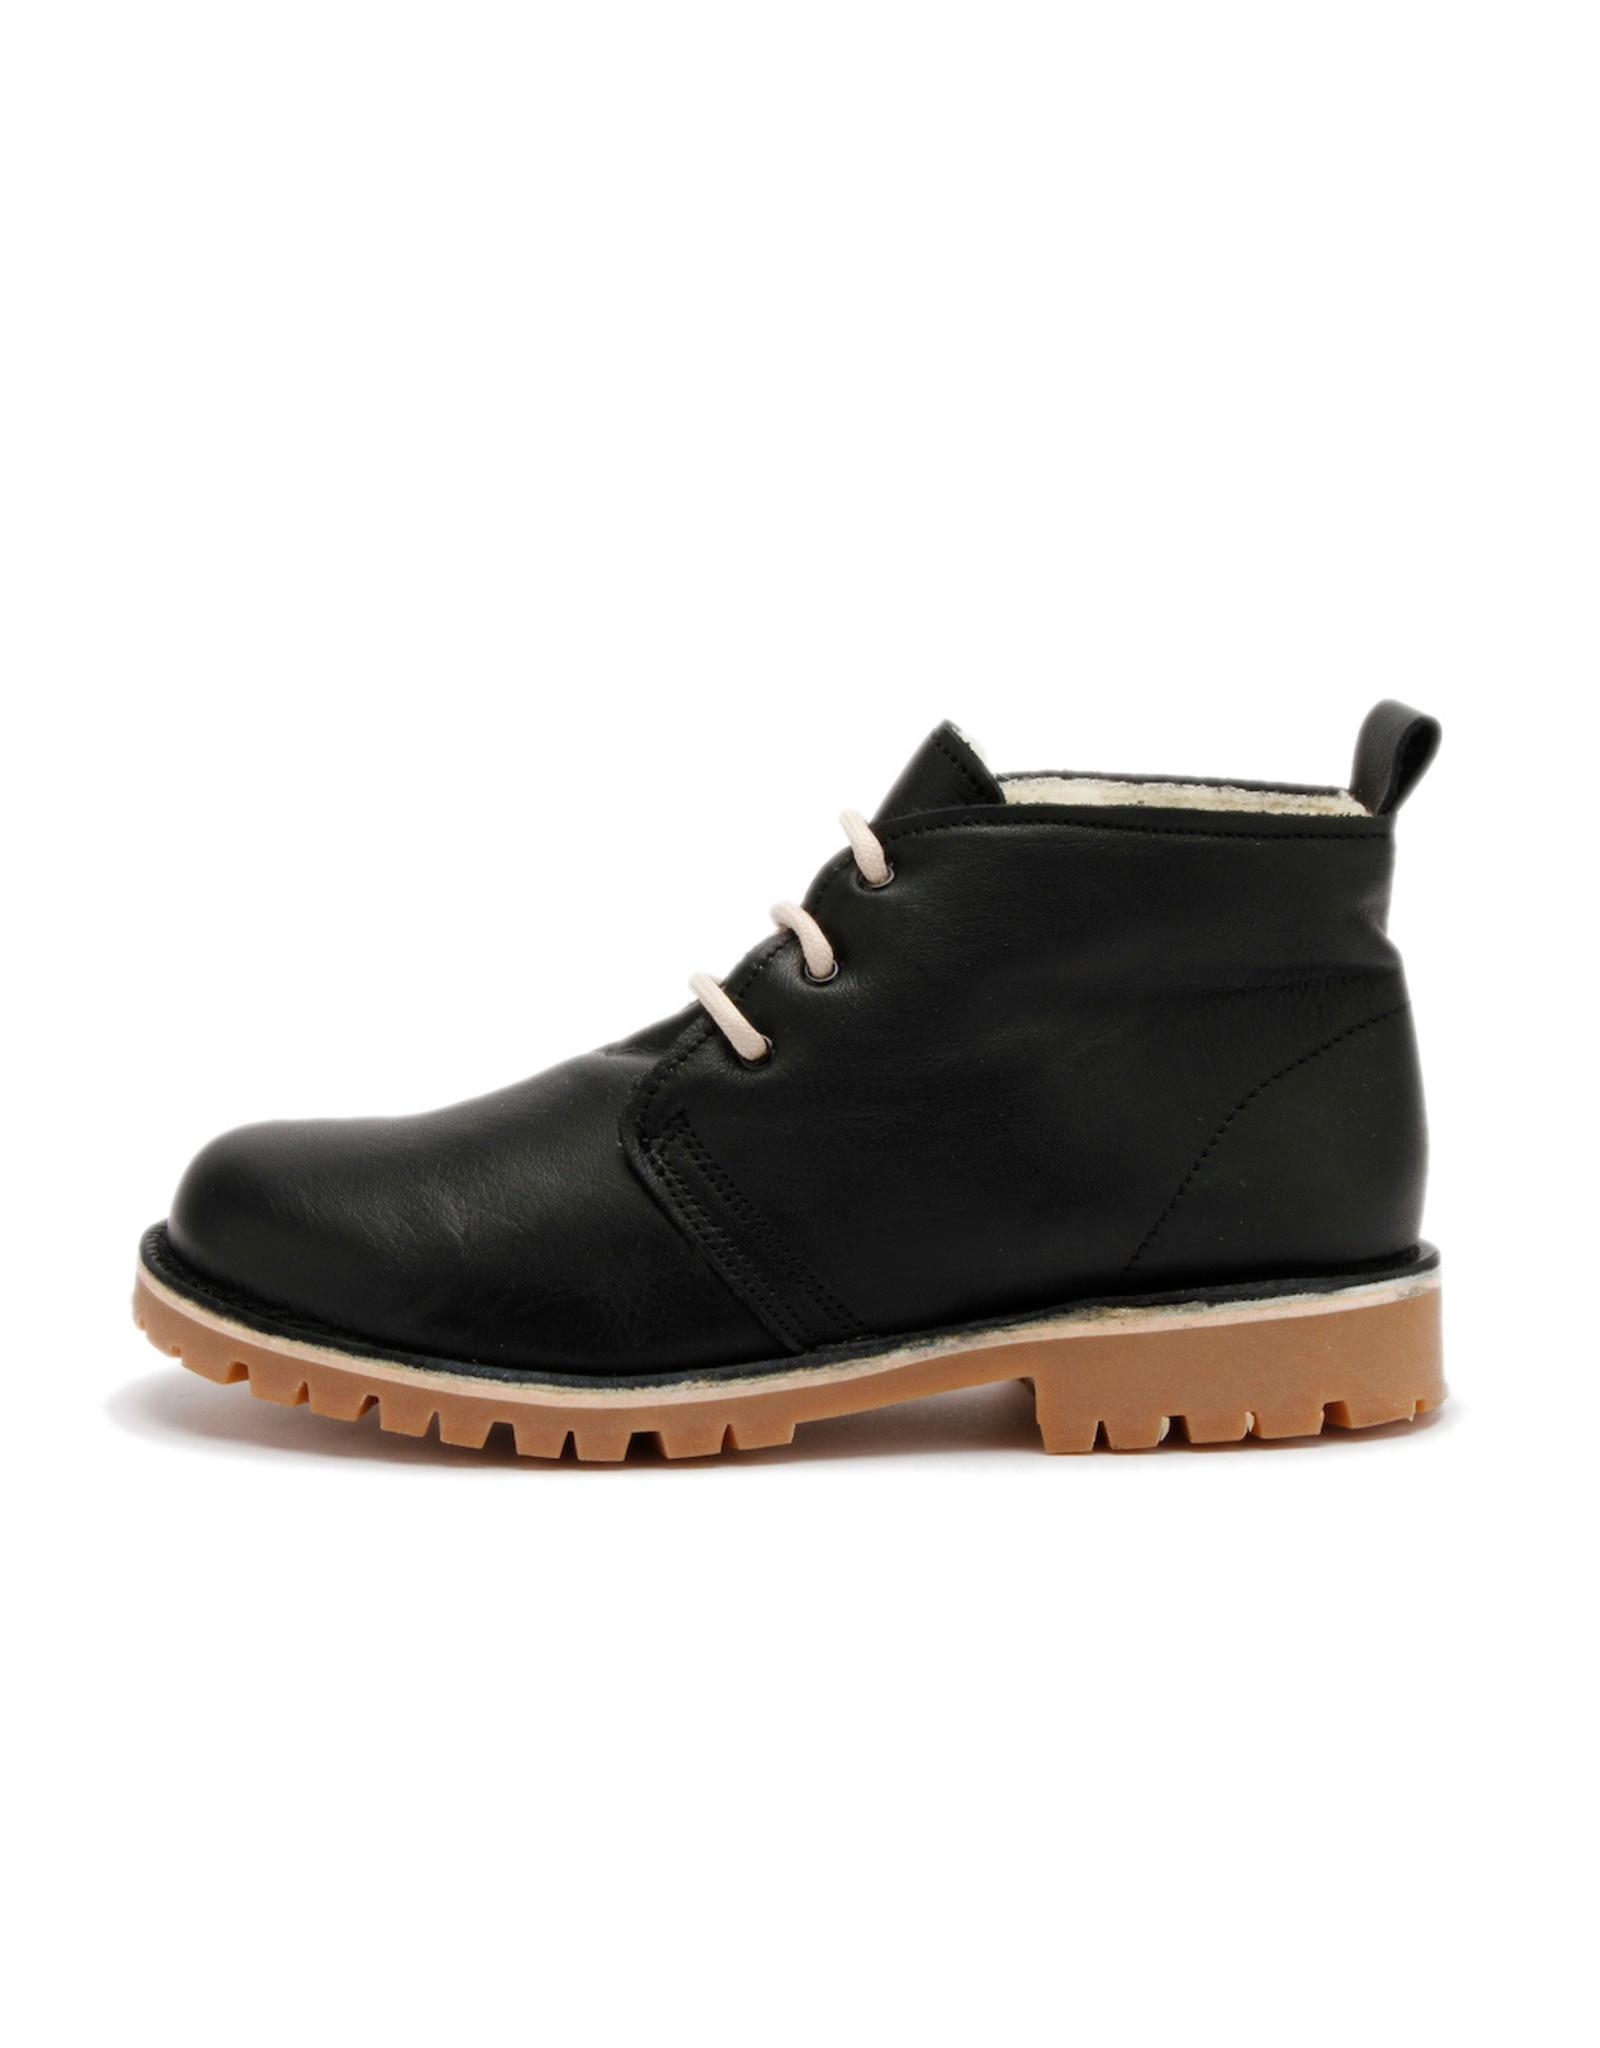 Grand Step Shoes Dari, gefütterter Schnürer